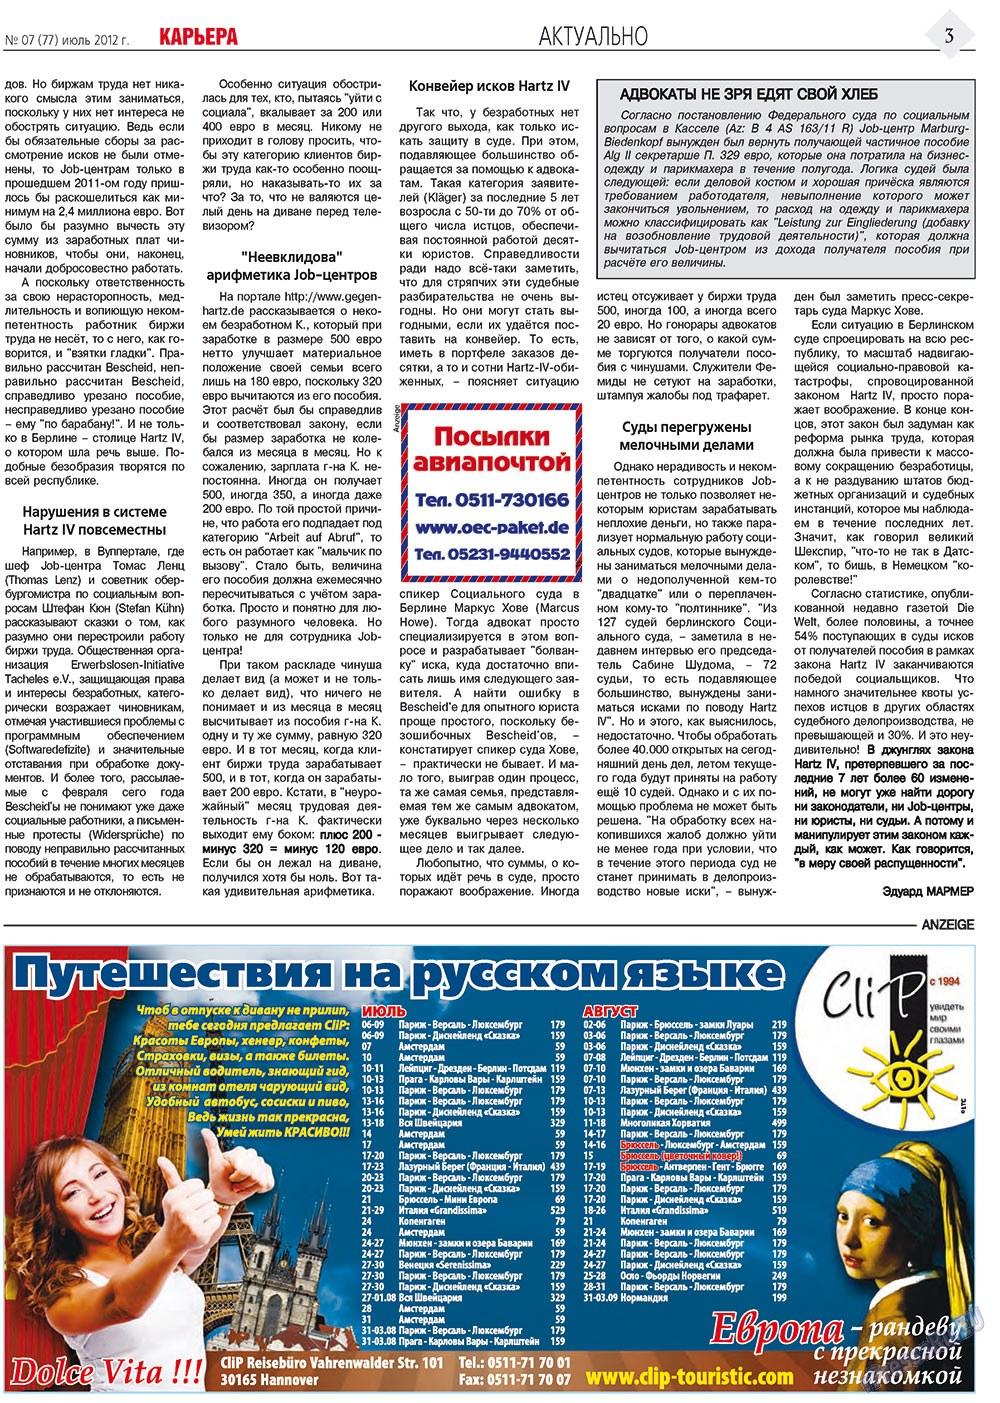 Карьера (газета). 2012 год, номер 7, стр. 3